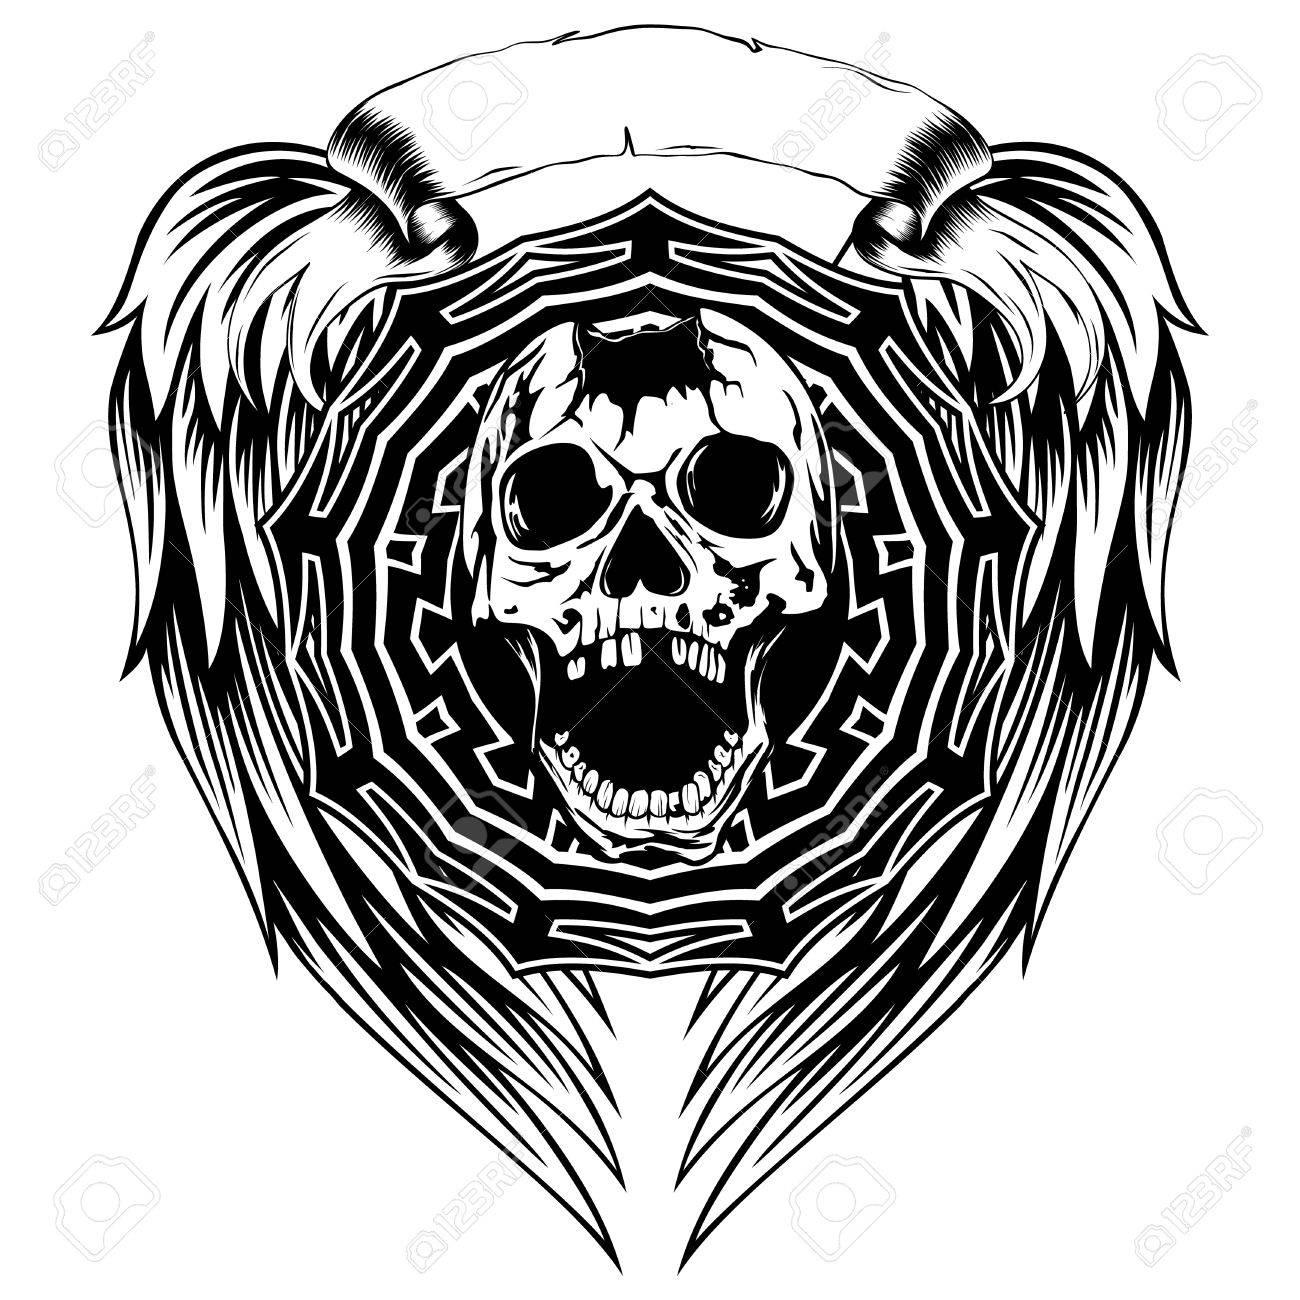 1300x1300 Abstract Vector Illustration Black And White Broken Skull